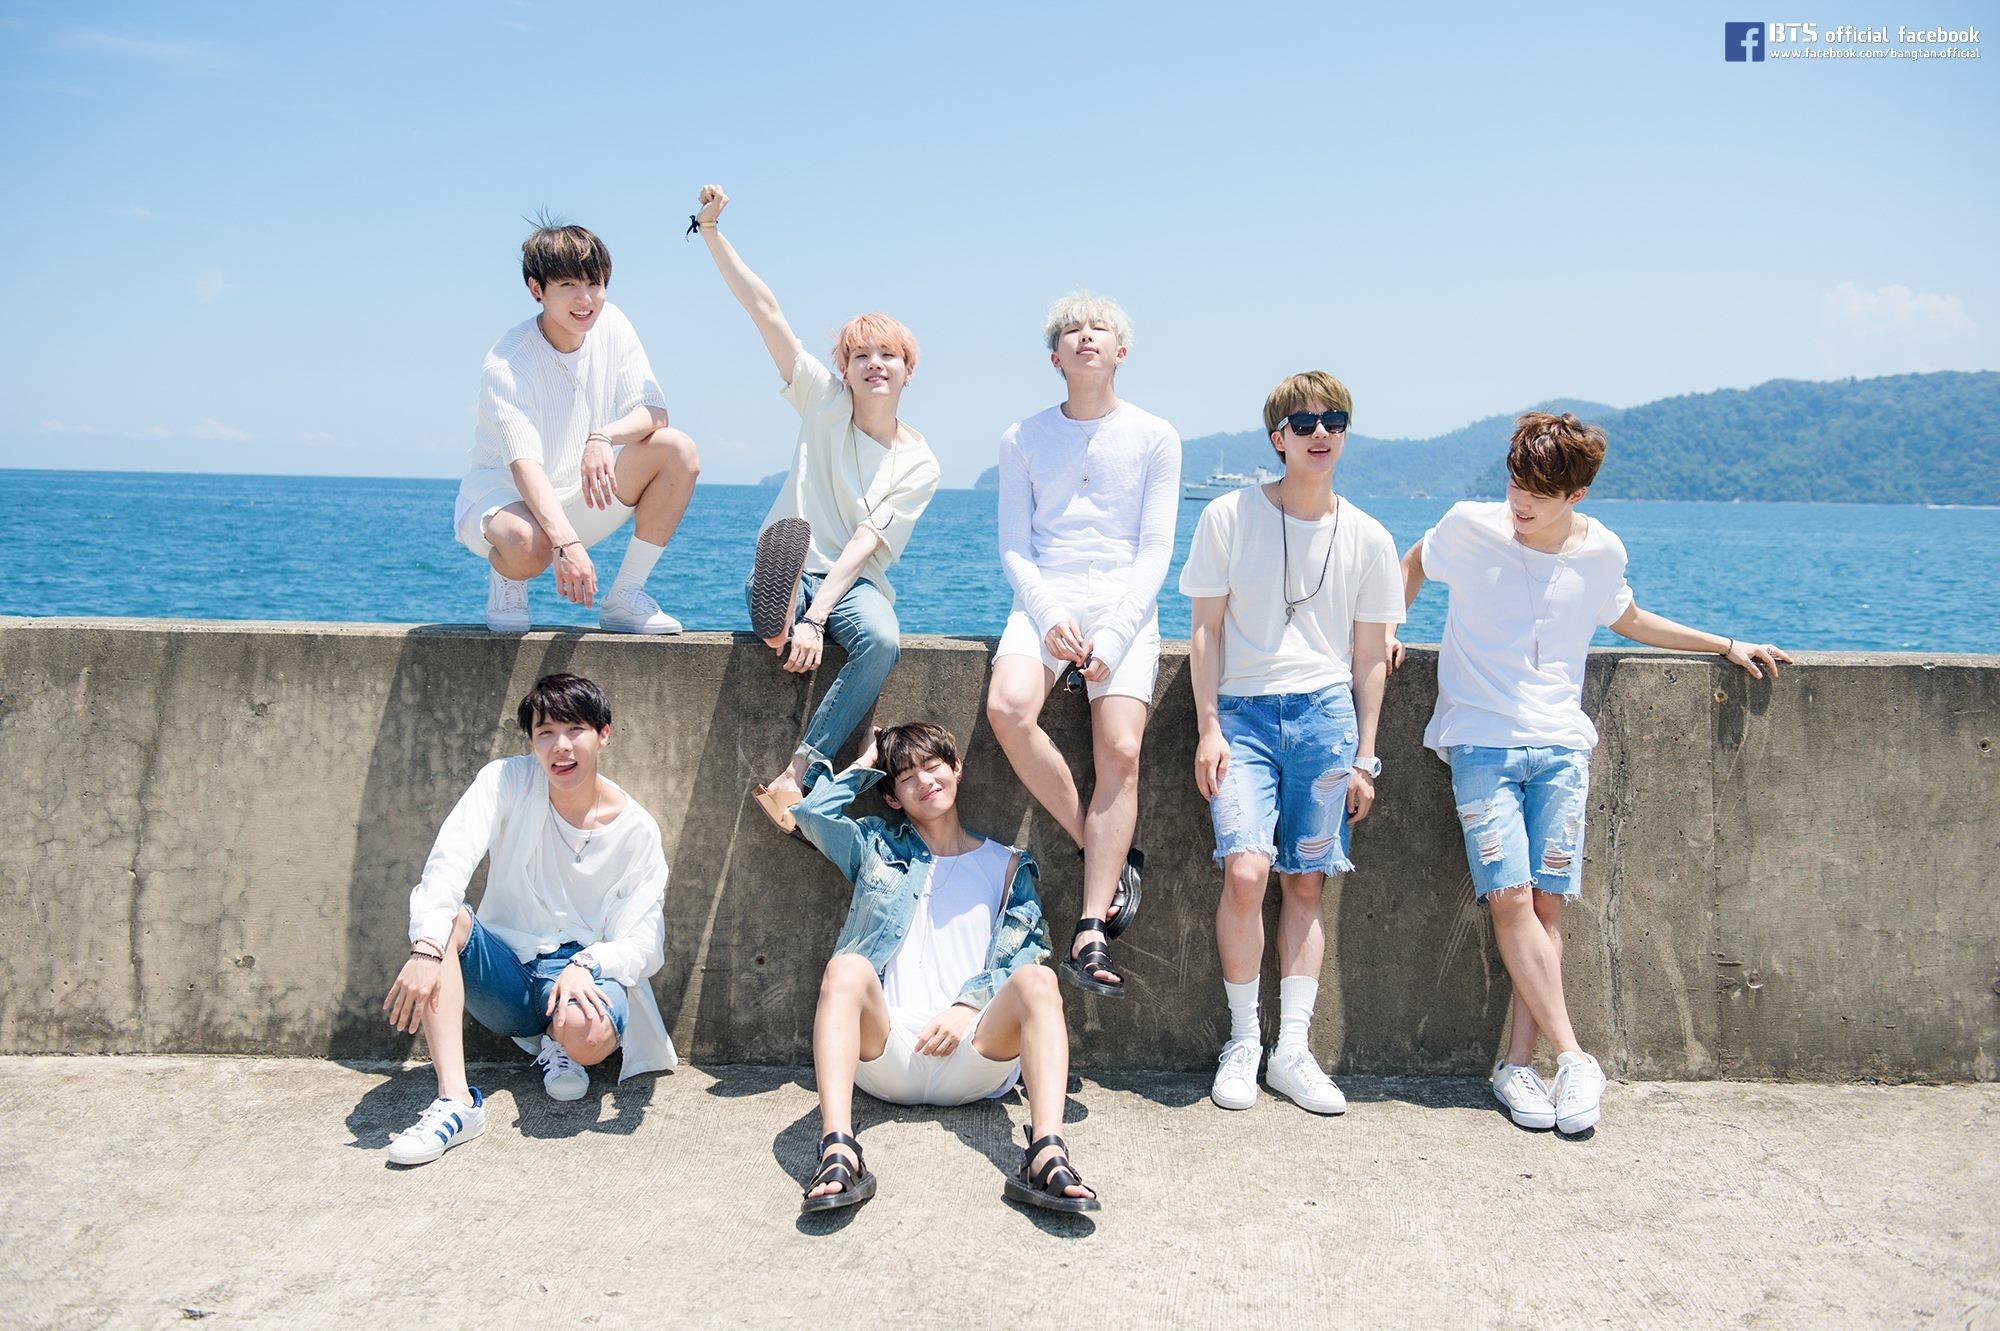 P nks Just Like Fire BTS stills Music Mania FOTP